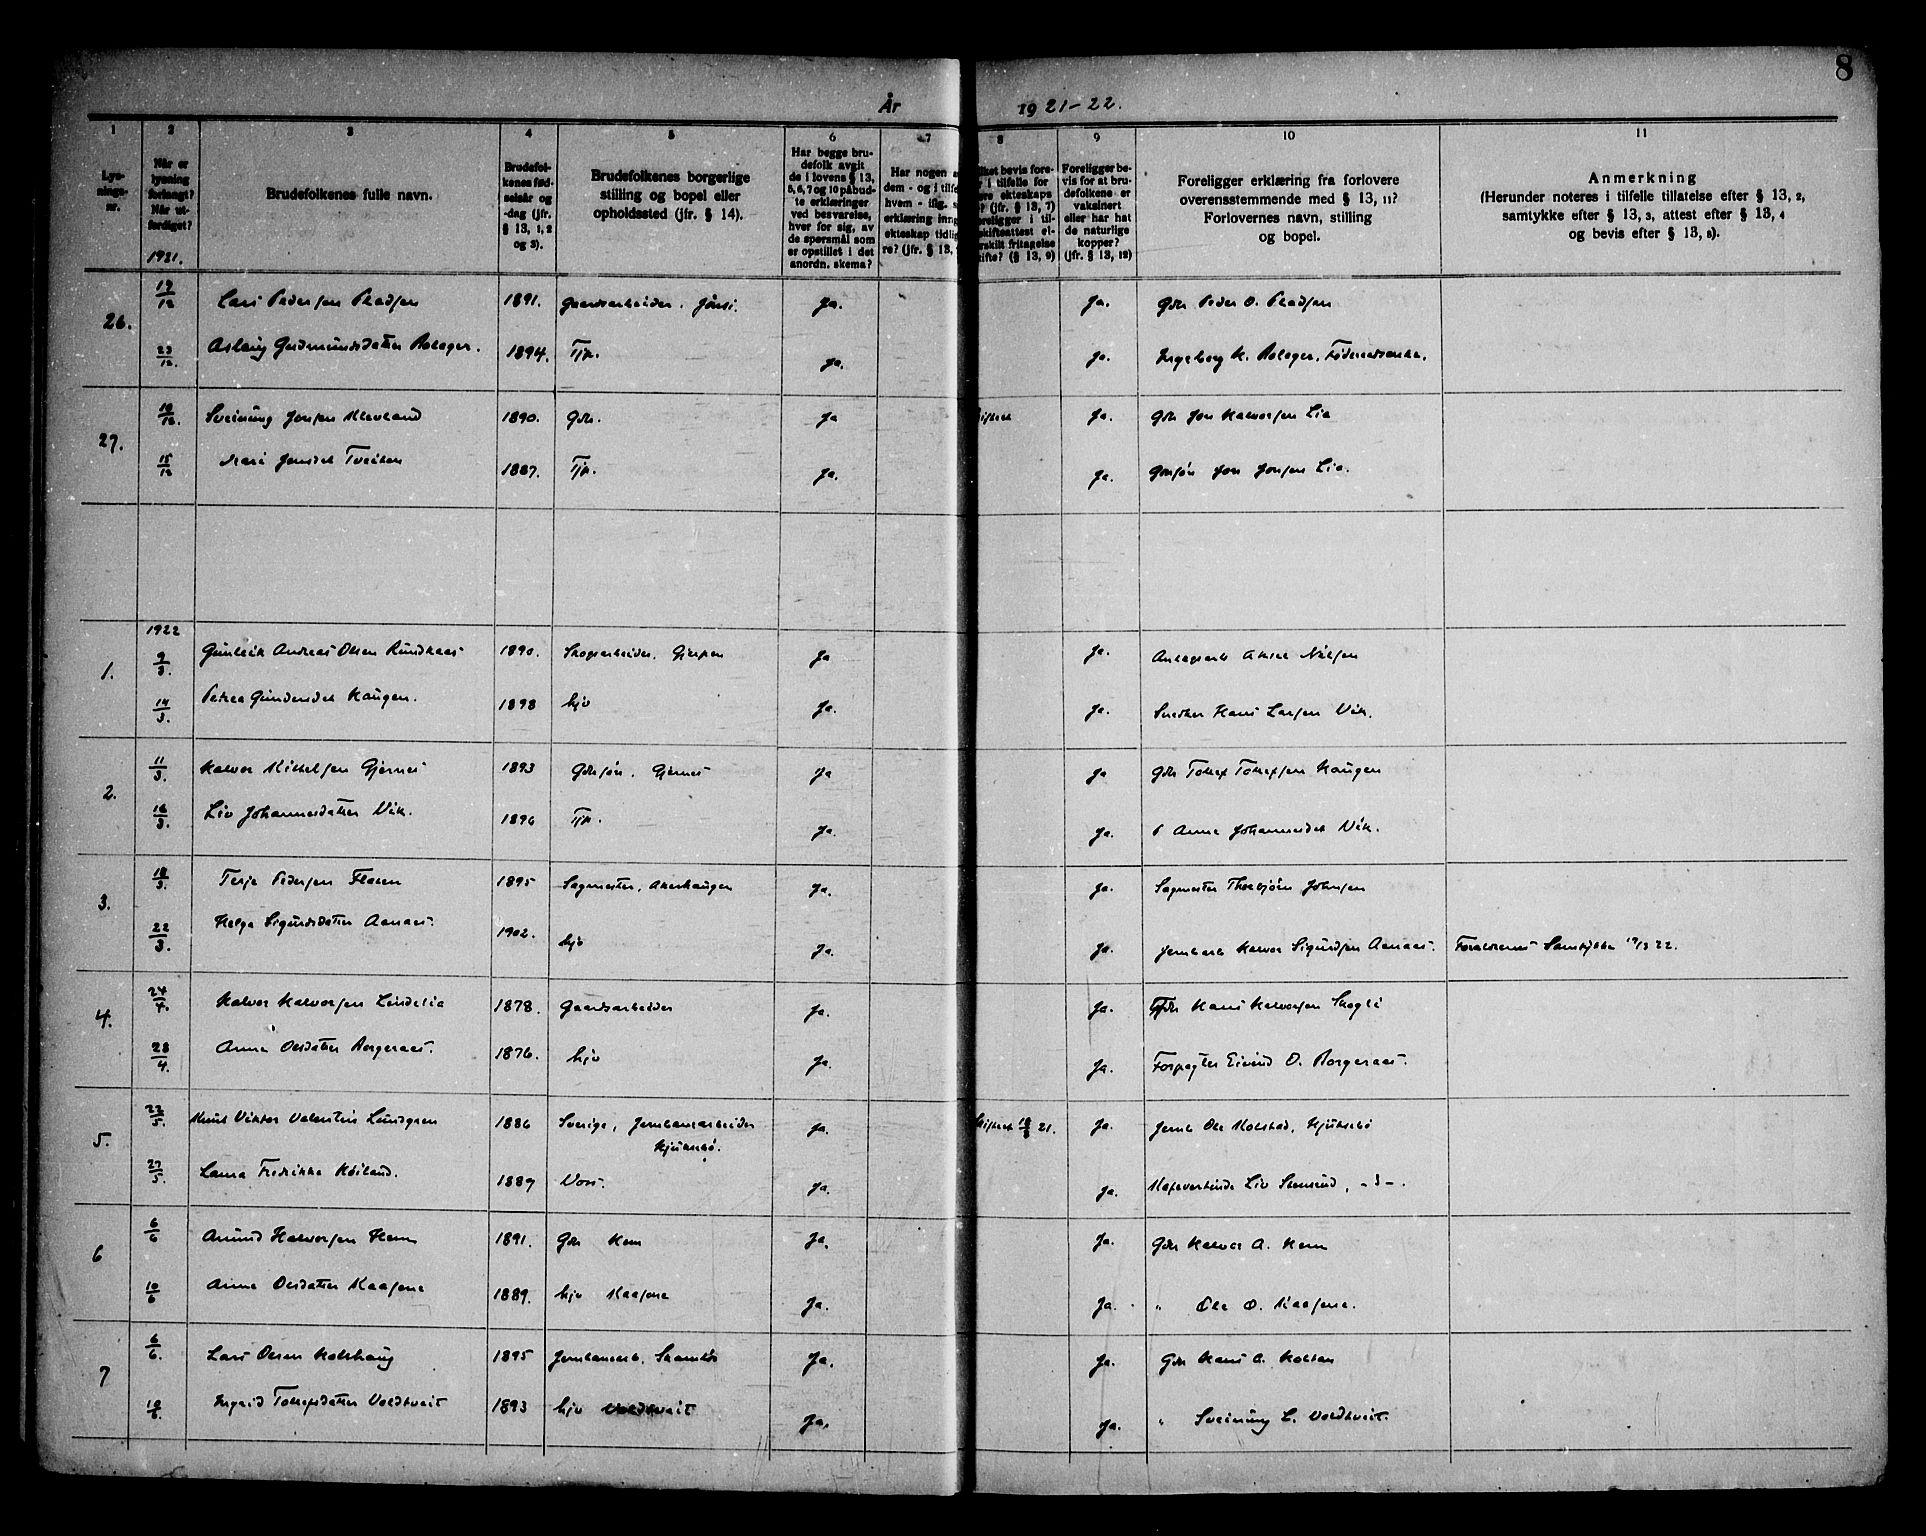 SAKO, Sauherad kirkebøker, H/Ha/L0001: Lysningsprotokoll nr. 1, 1919-1960, s. 8